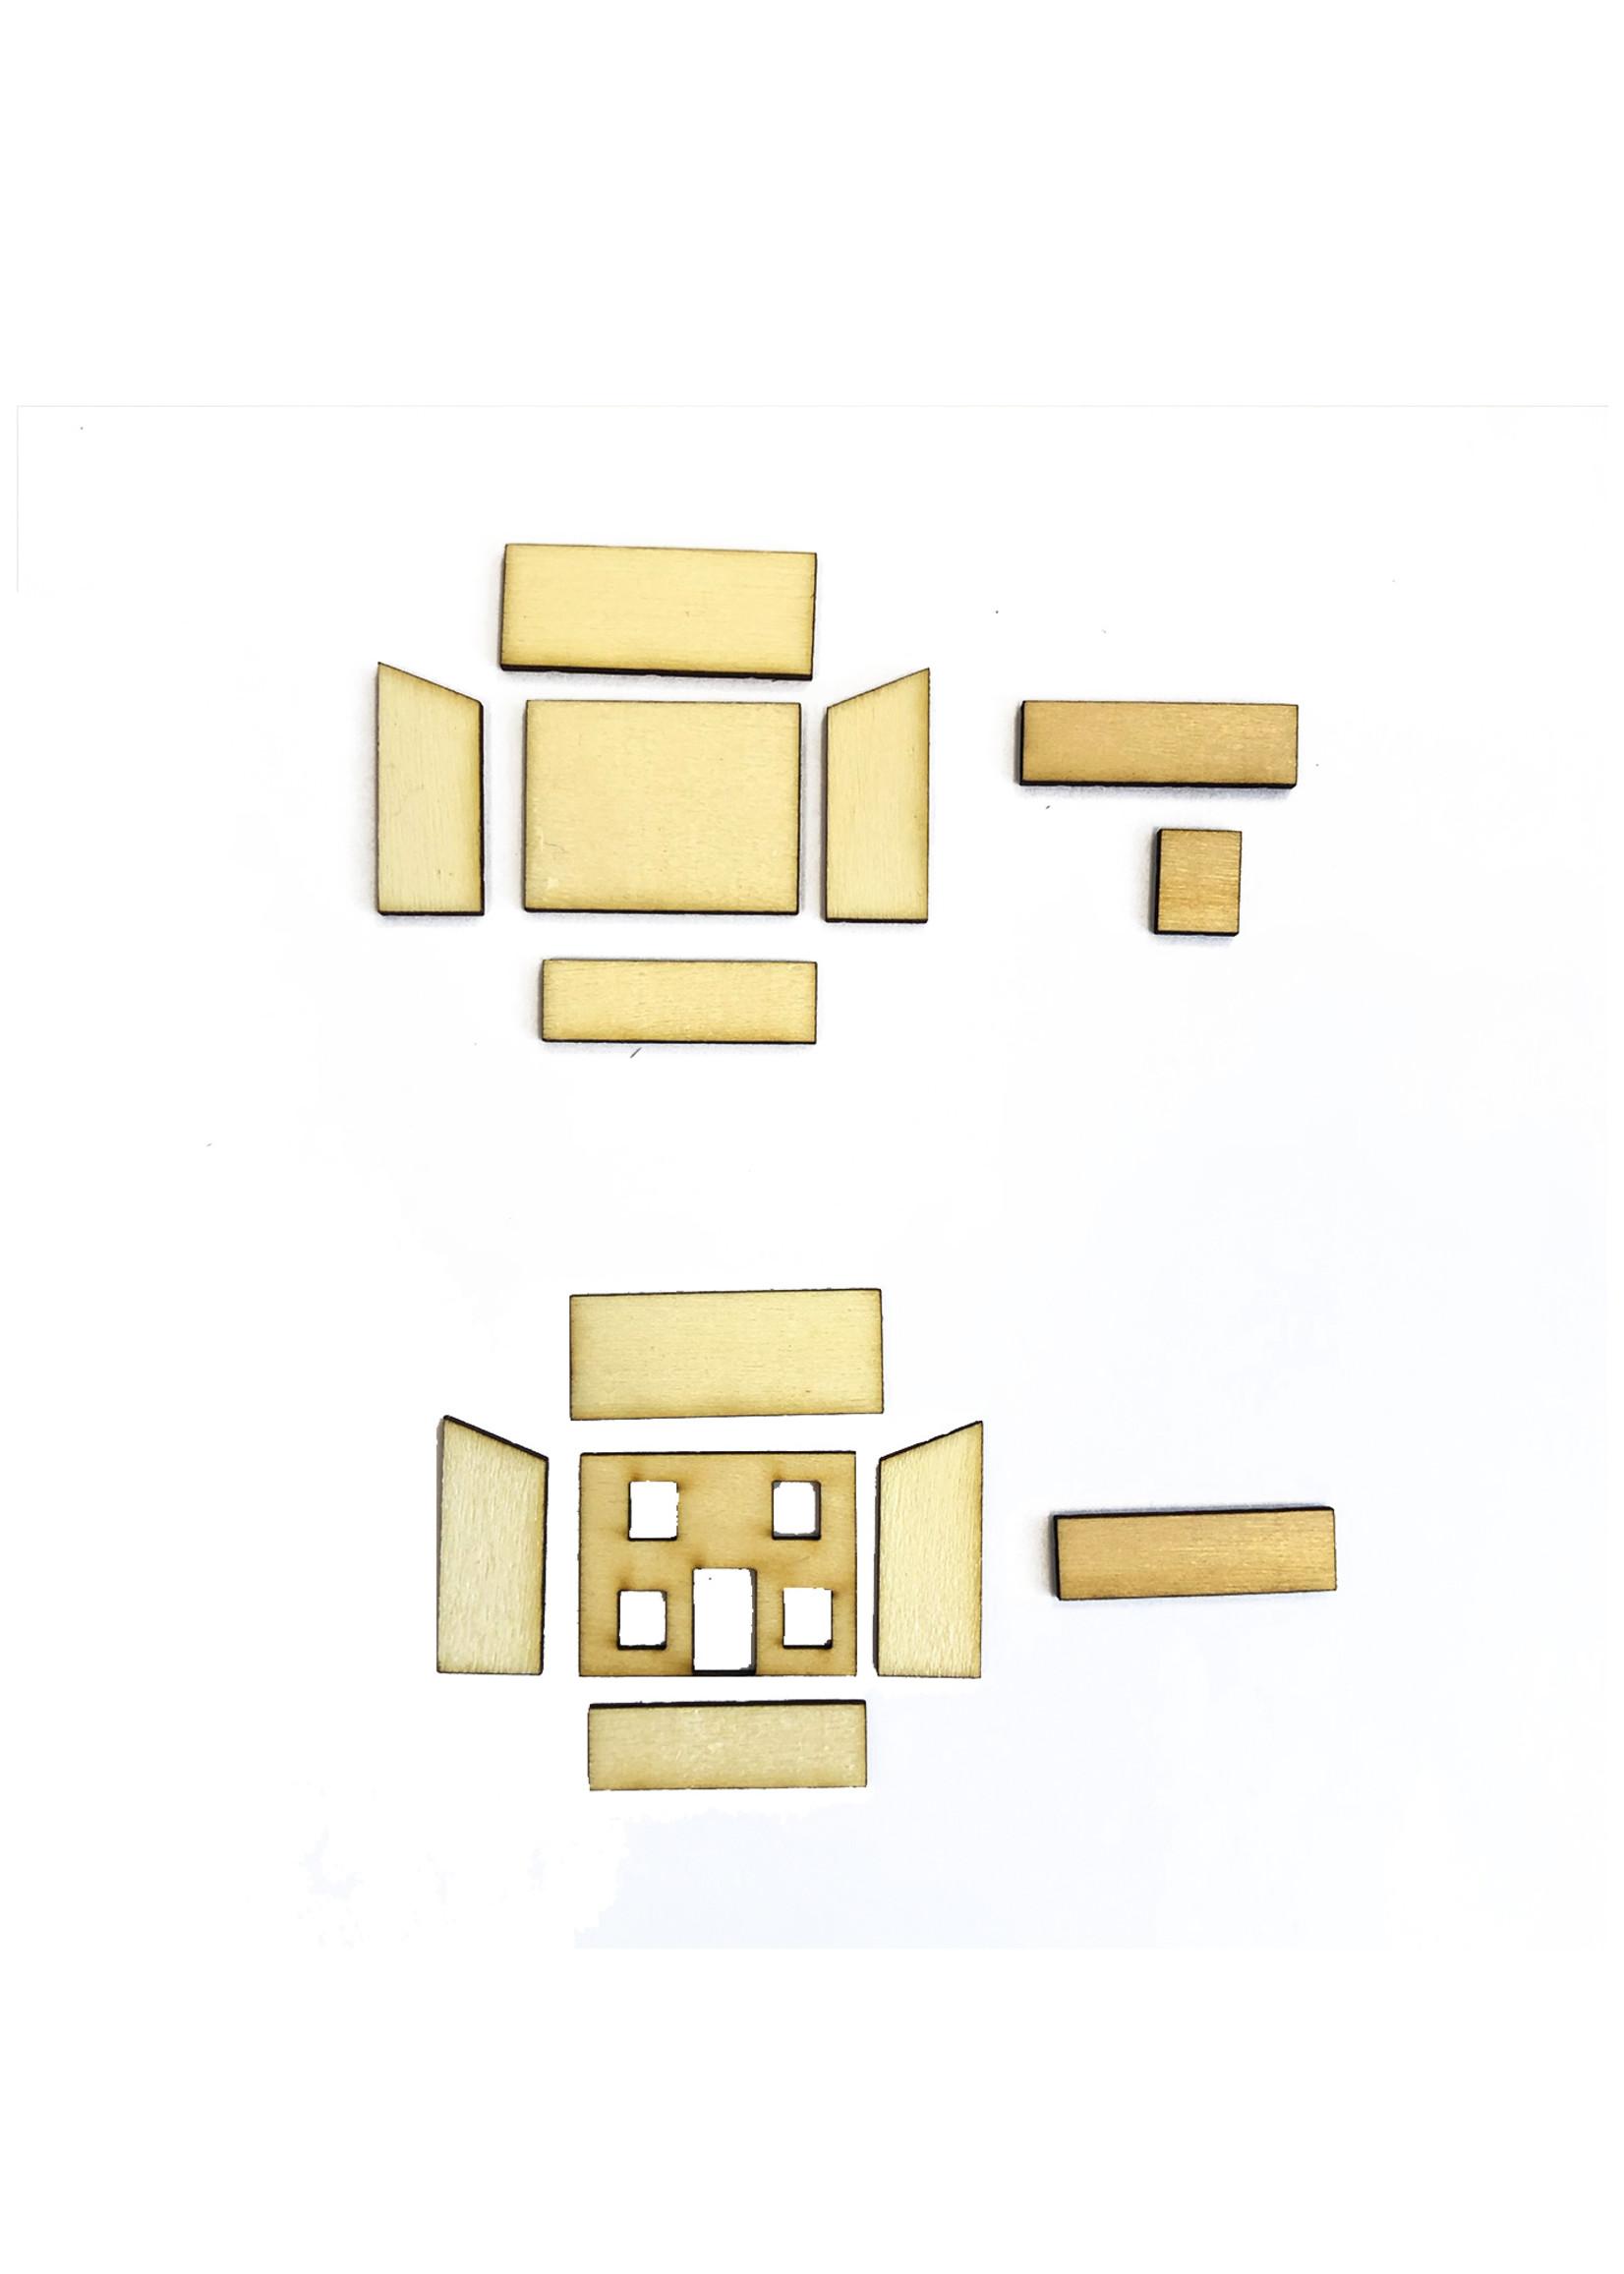 Zelfbouw pakket om een mini poppenhuisje te bouwen